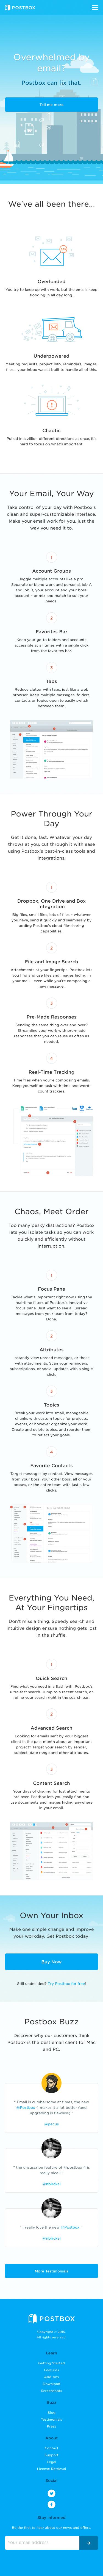 Postbox Inc 08